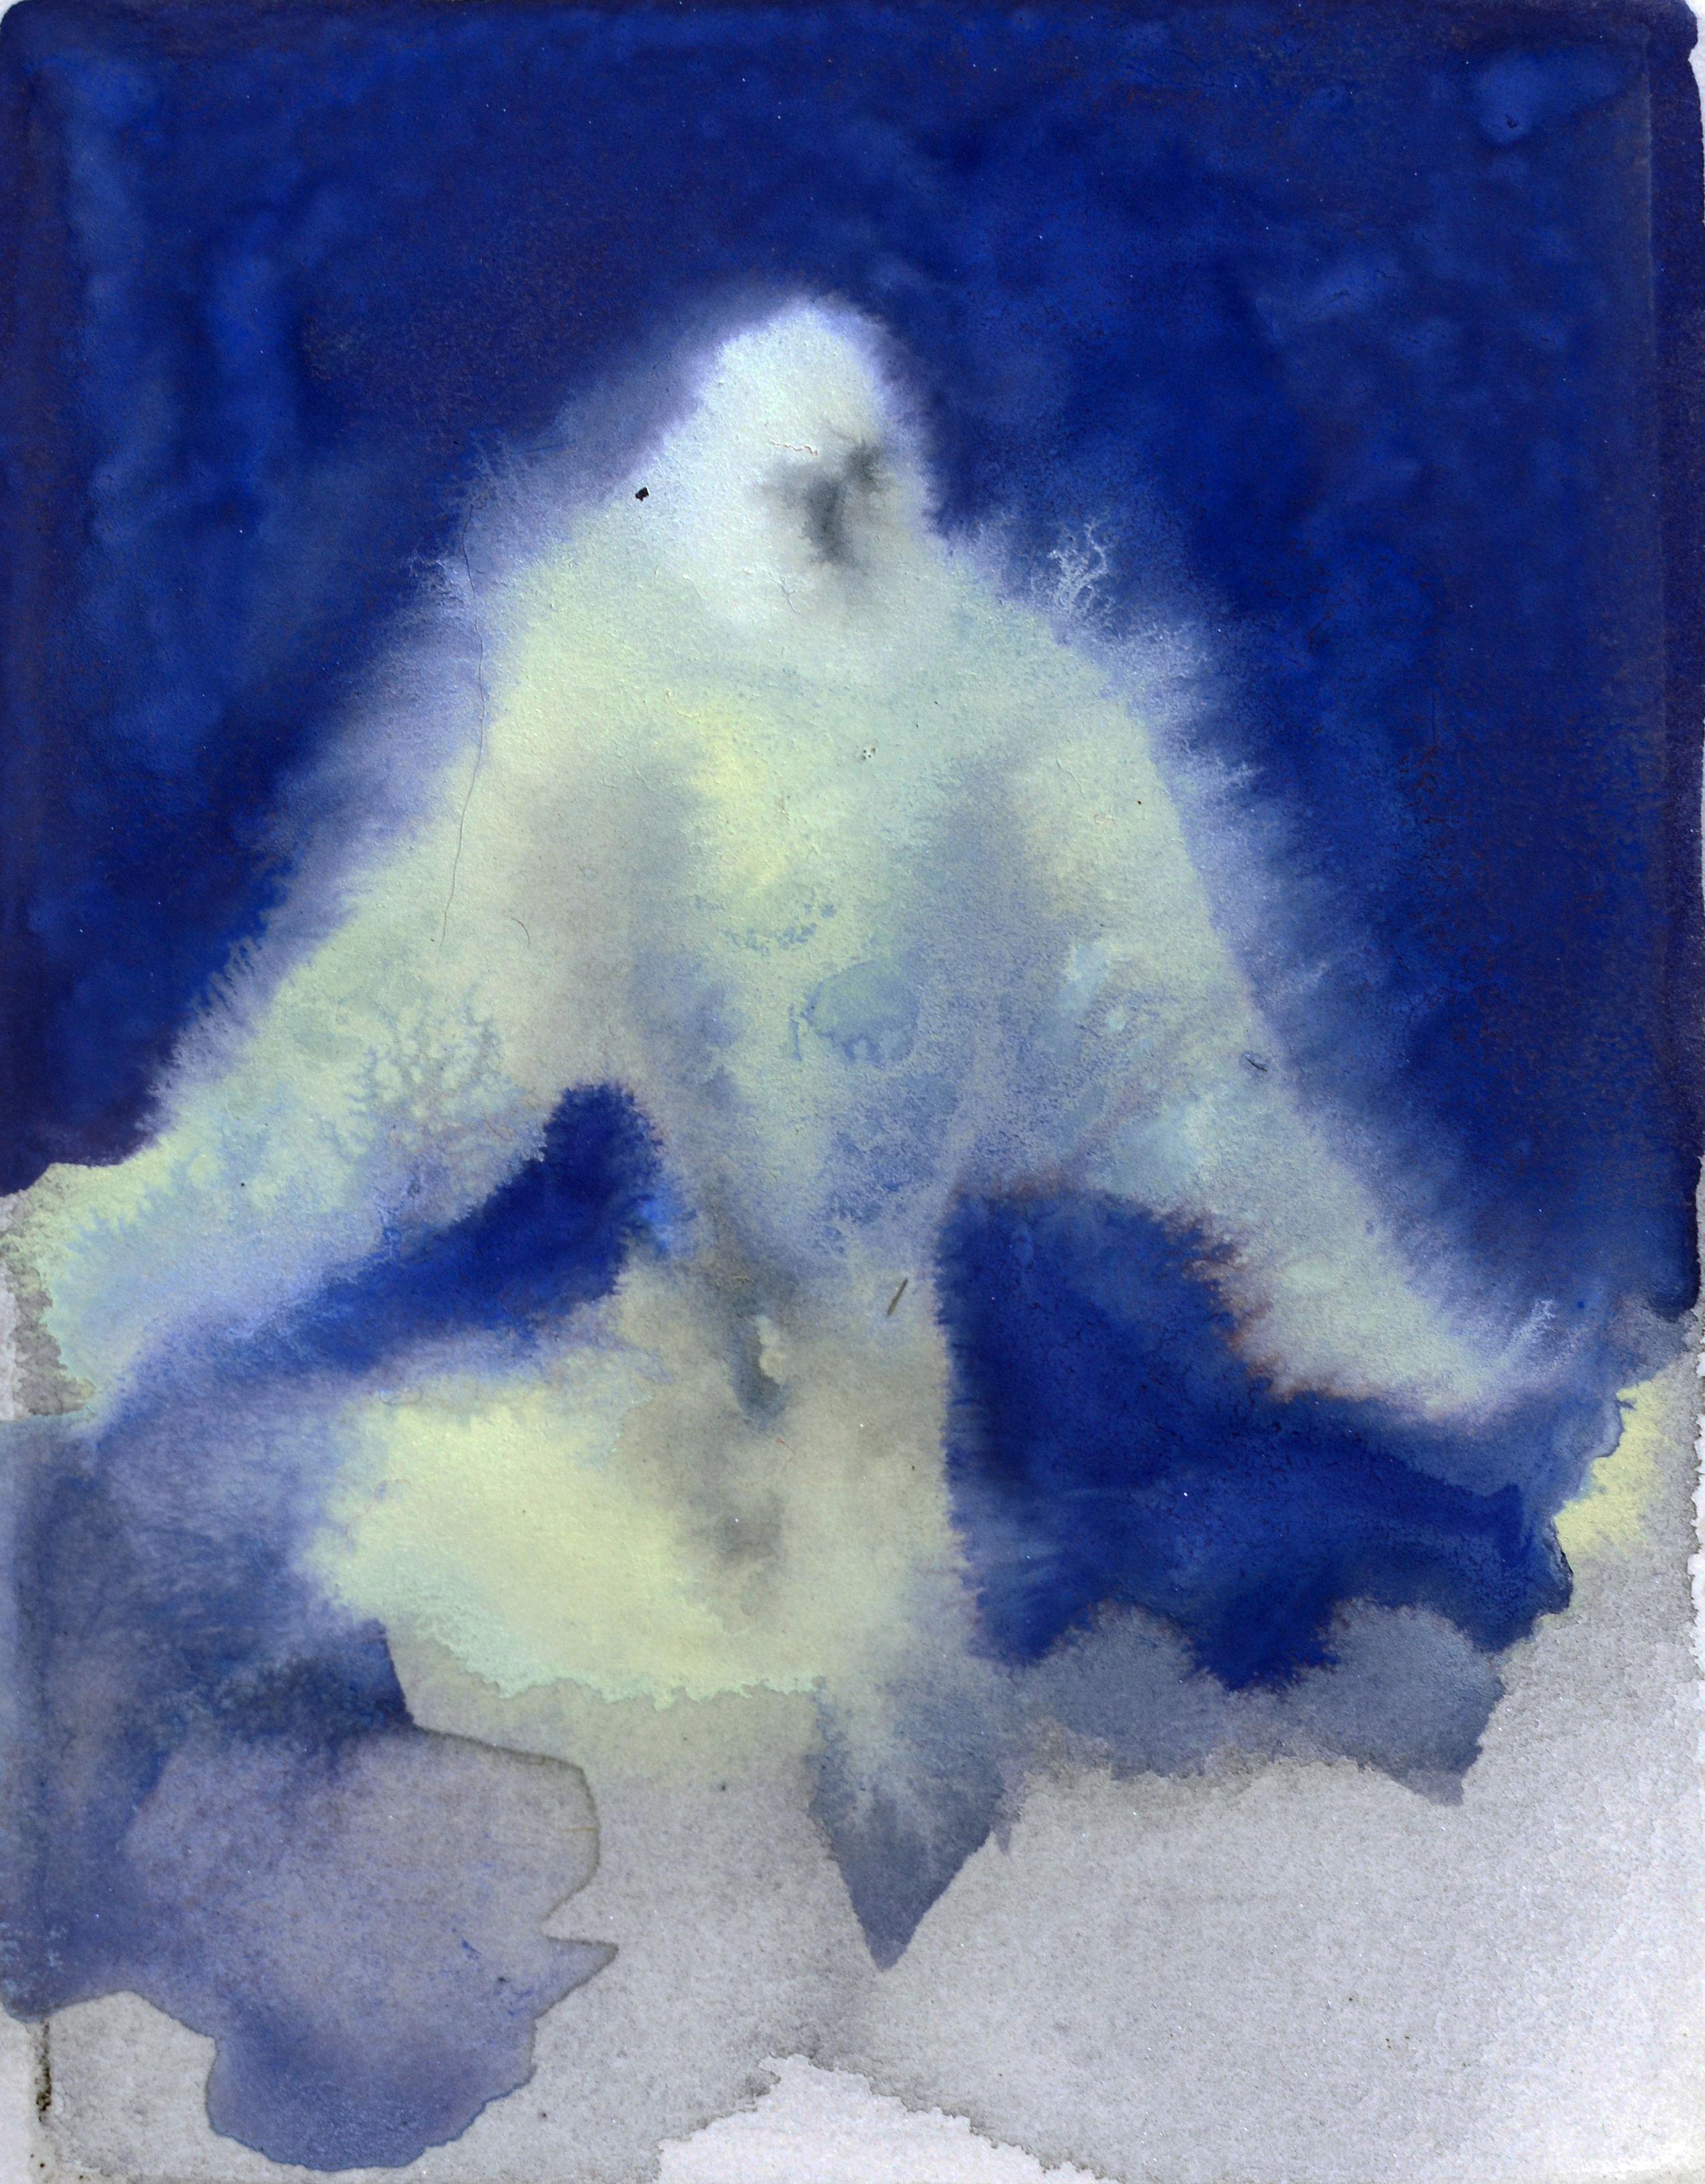 Rebecca_Kinkead_White Dove (Night)_4x3 inset on 11x7.5.jpg